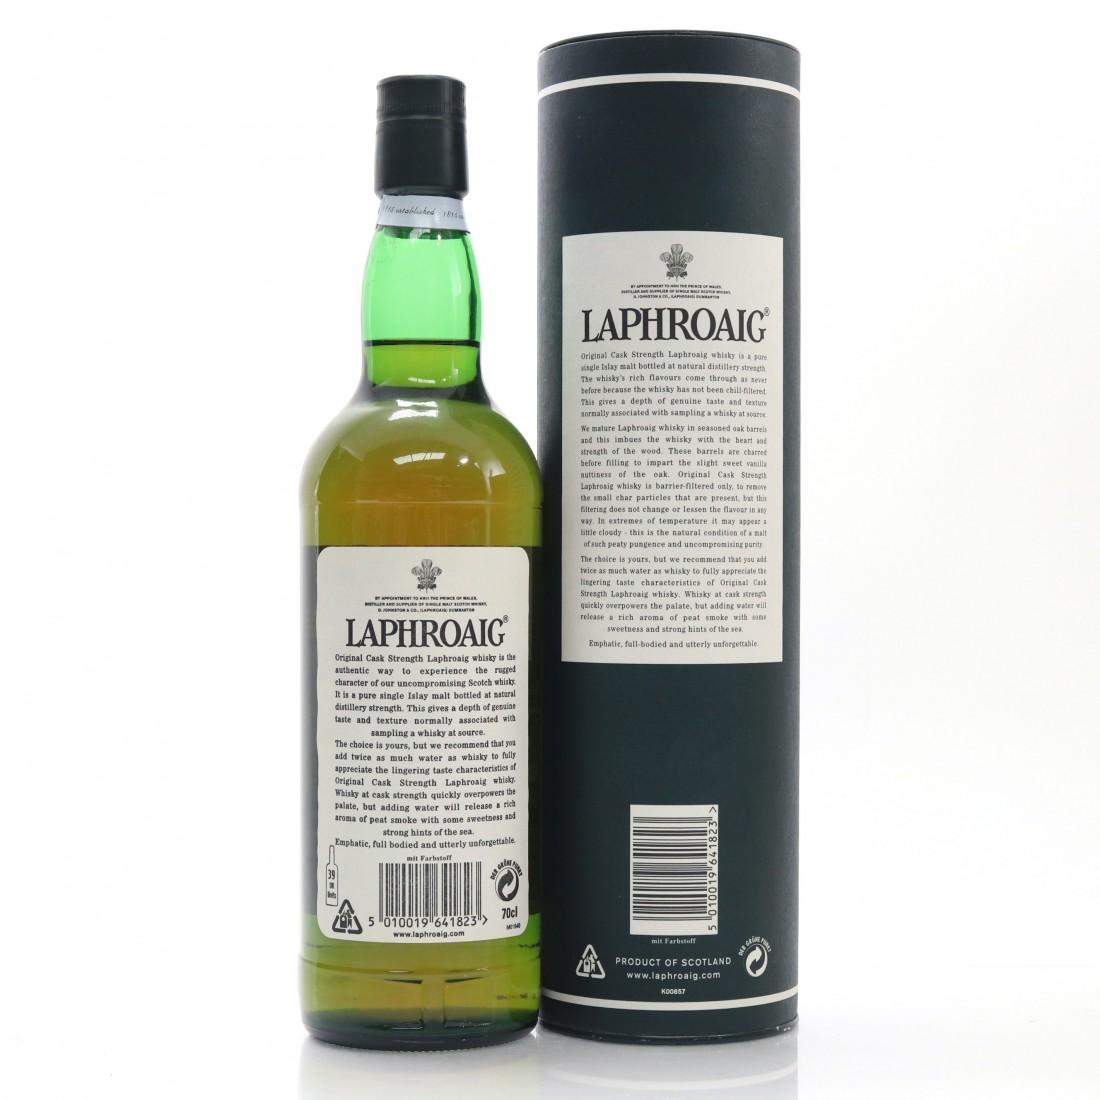 Laphroaig 10 Year Old Original Cask Strength / 55.7%